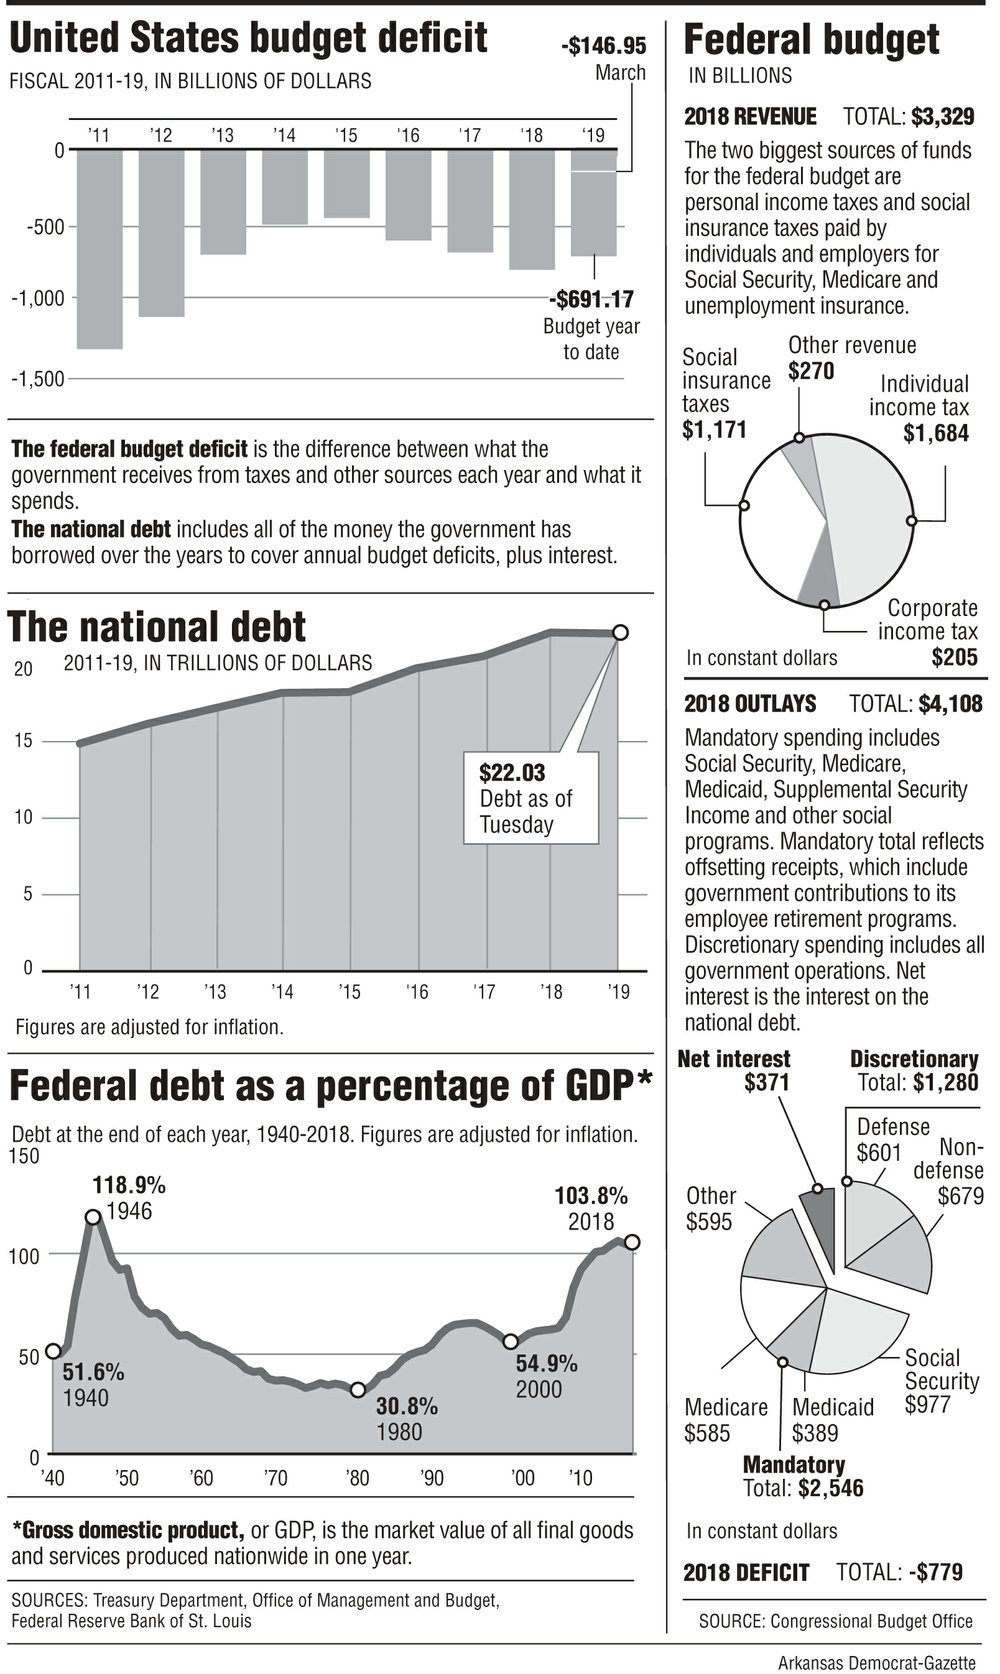 U S ' deficit tops $146B in March